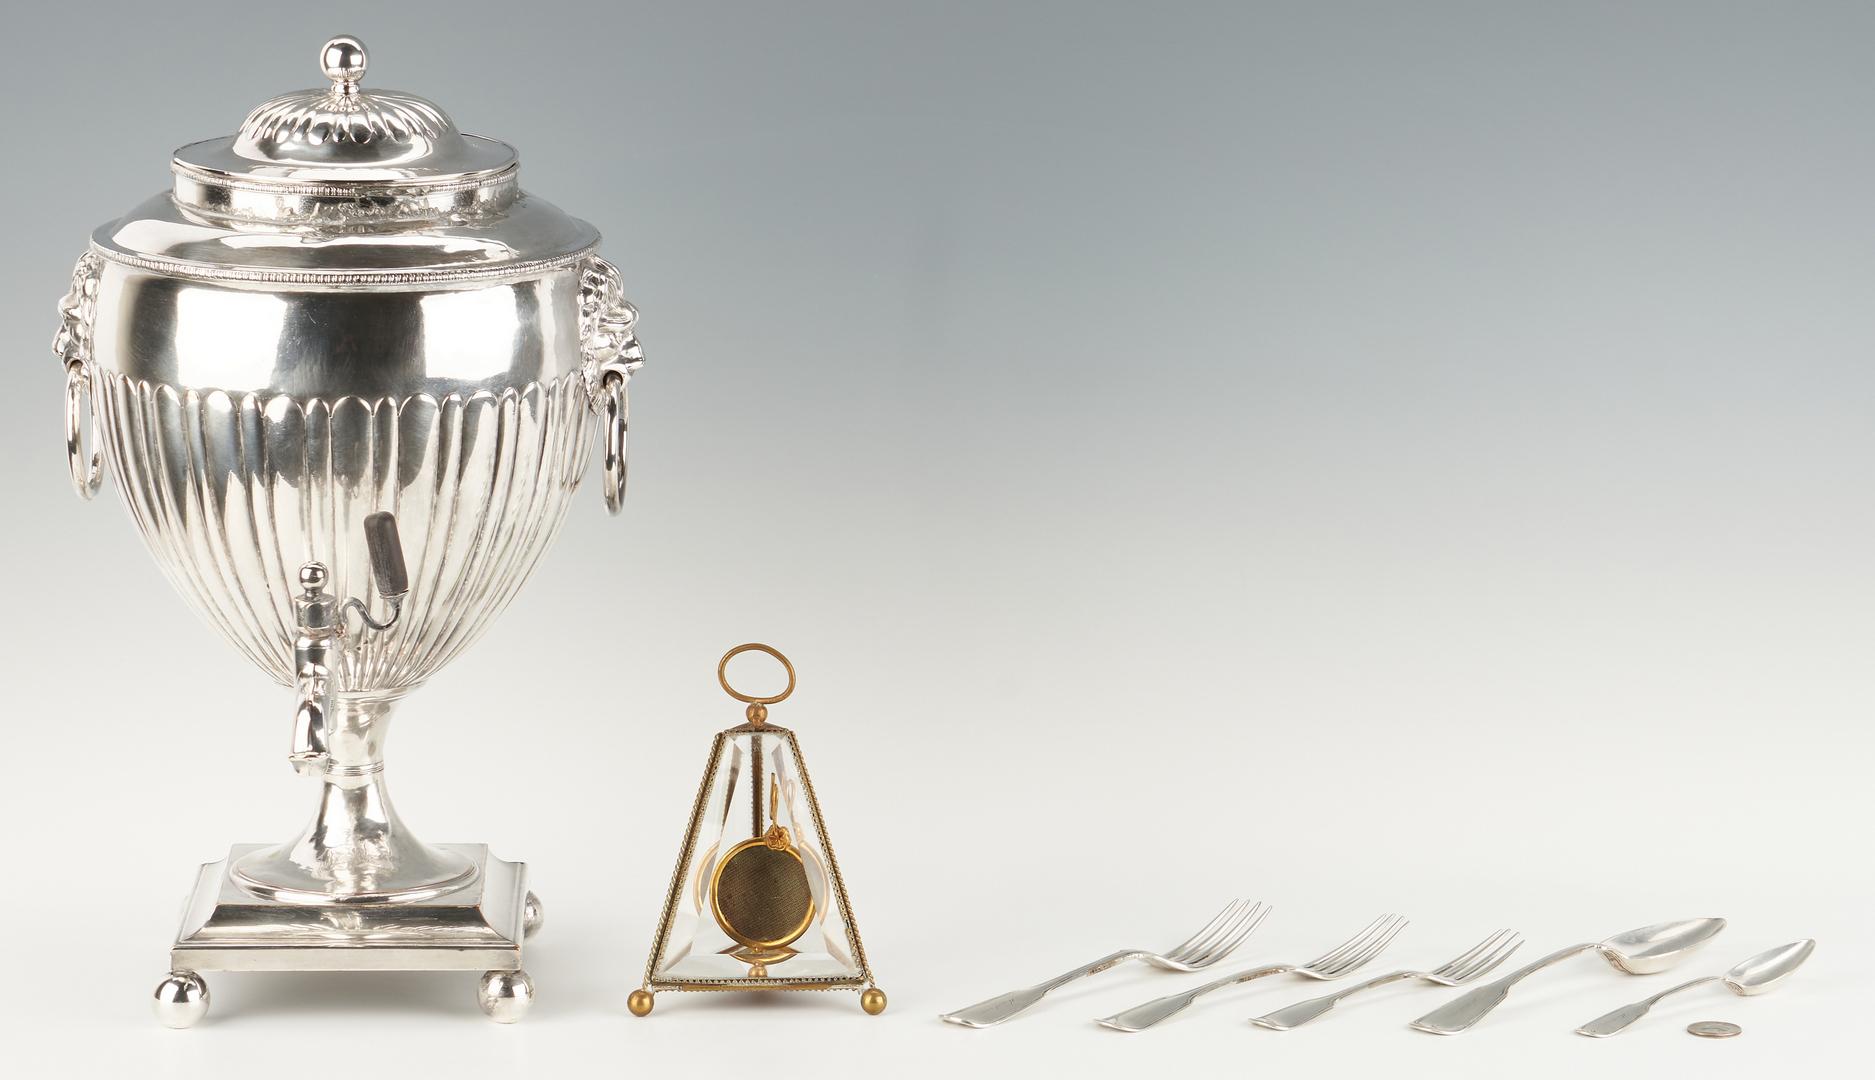 Lot 952: Sheffield Tea Urn, 5 Coin Silver Items, & Watch Hutch